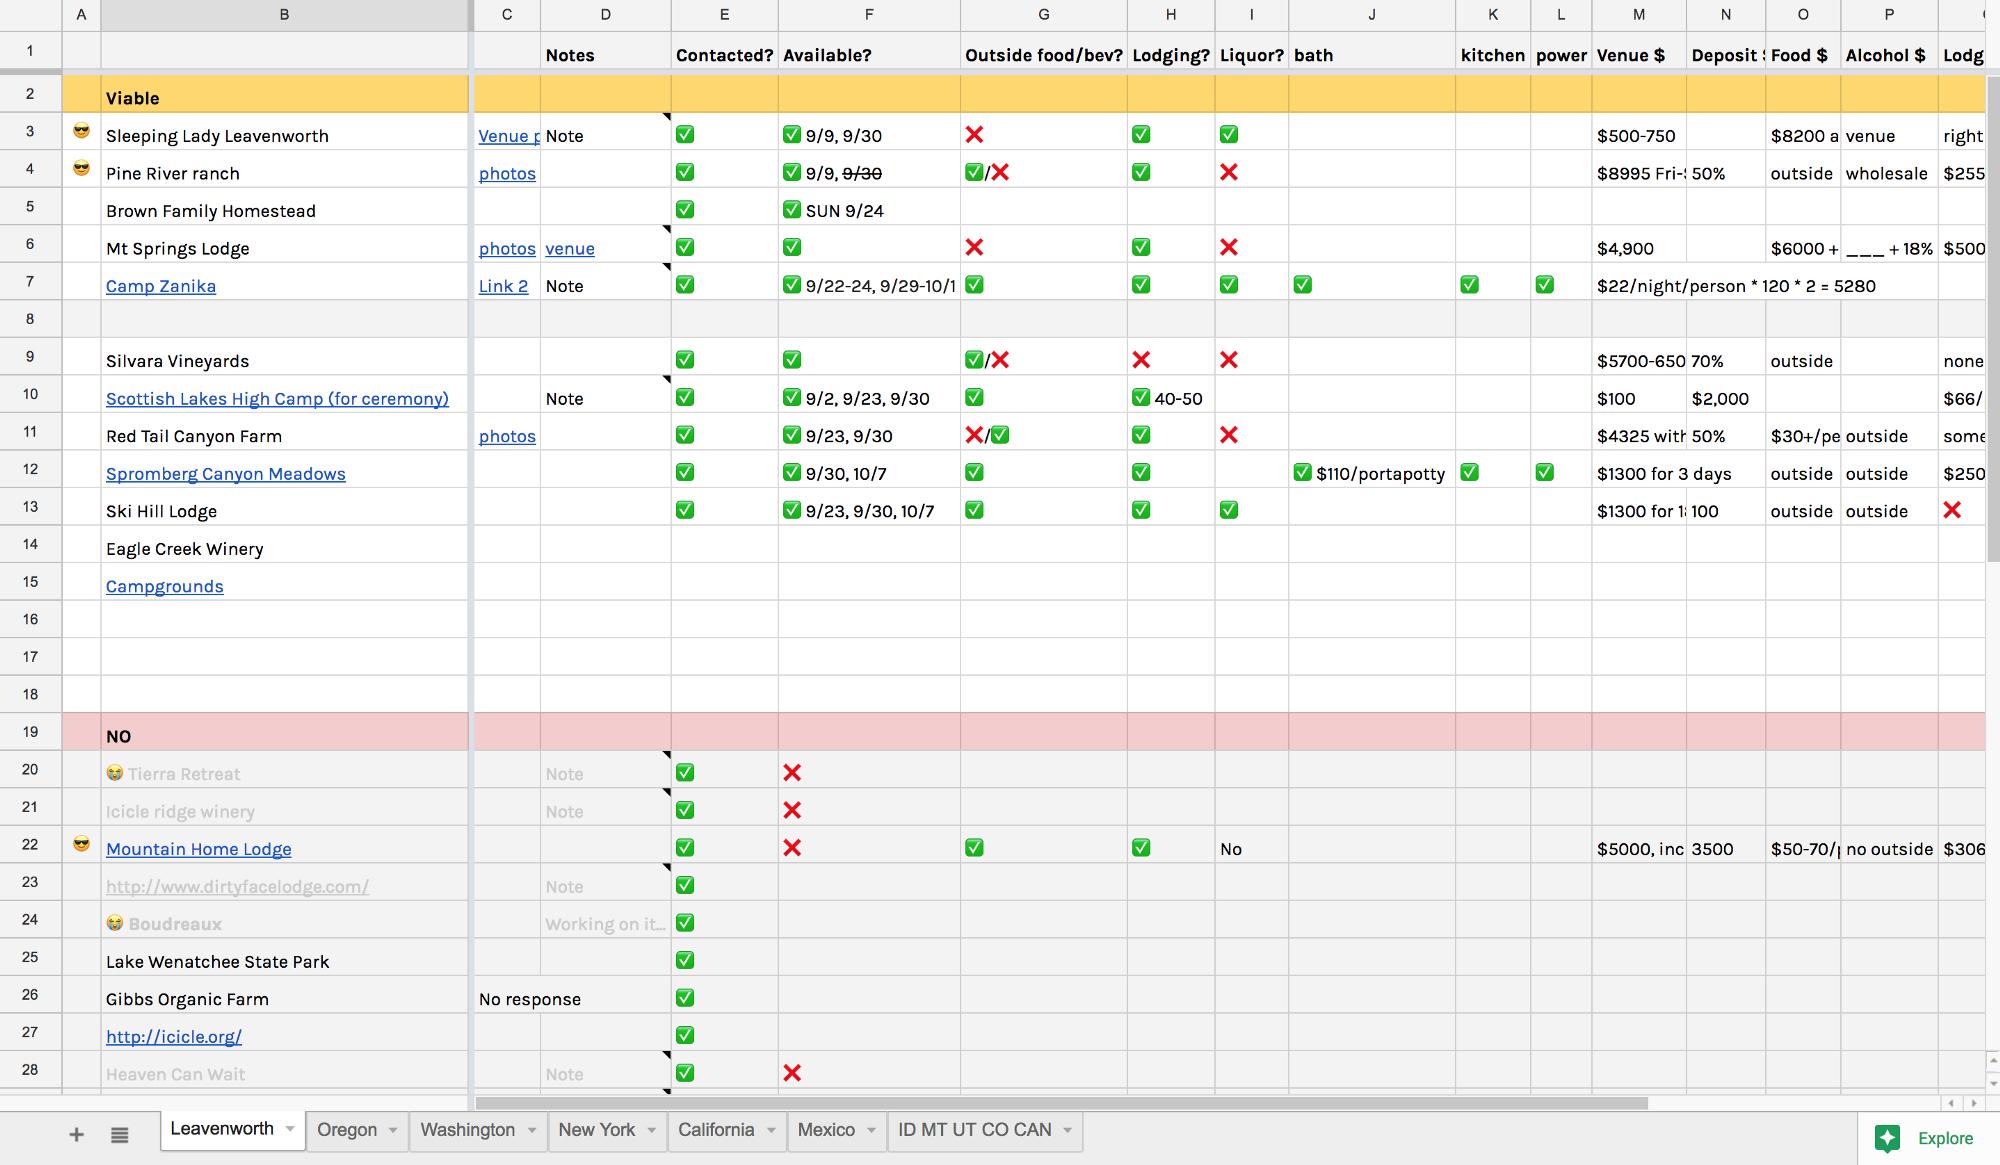 Wedding Planning Spreadsheet Template On Spreadsheet For Mac Sample To Wedding Planning Spreadsheet Template